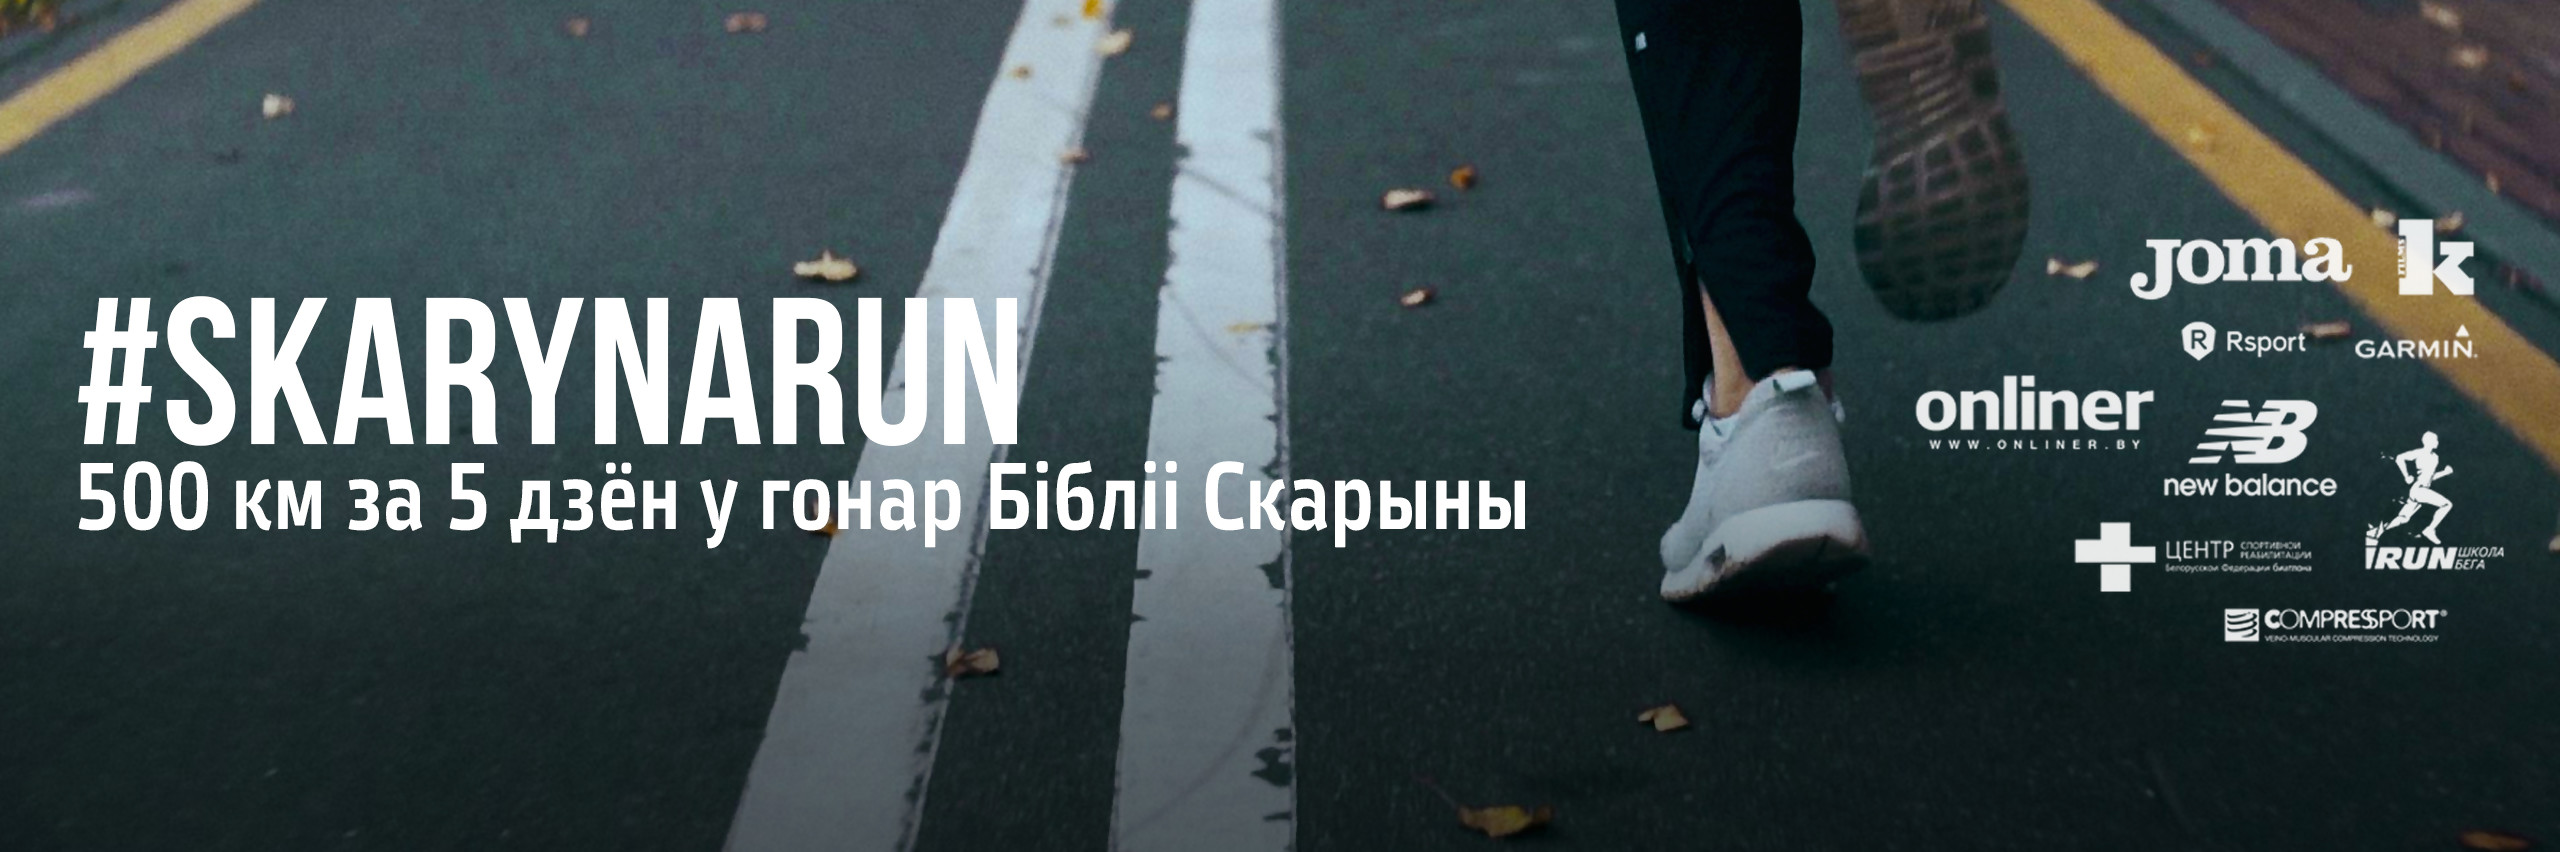 #SkarynaRun Прямая трансляция пробега